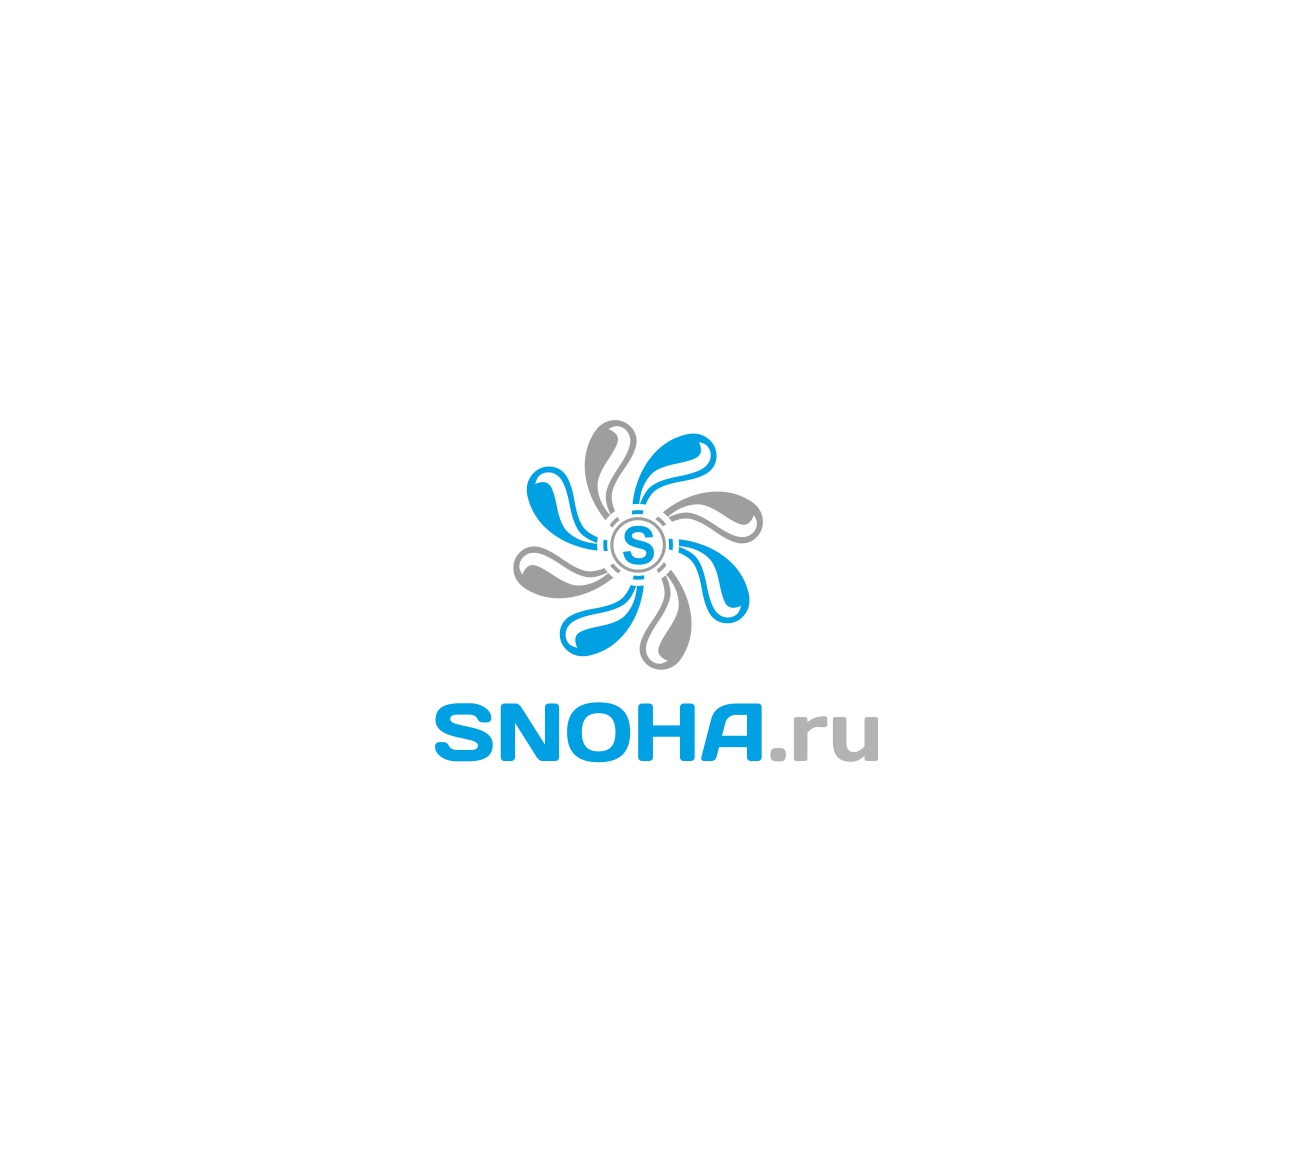 Логотип клининговой компании, сайт snoha.ru фото f_45854a26c658828e.jpg